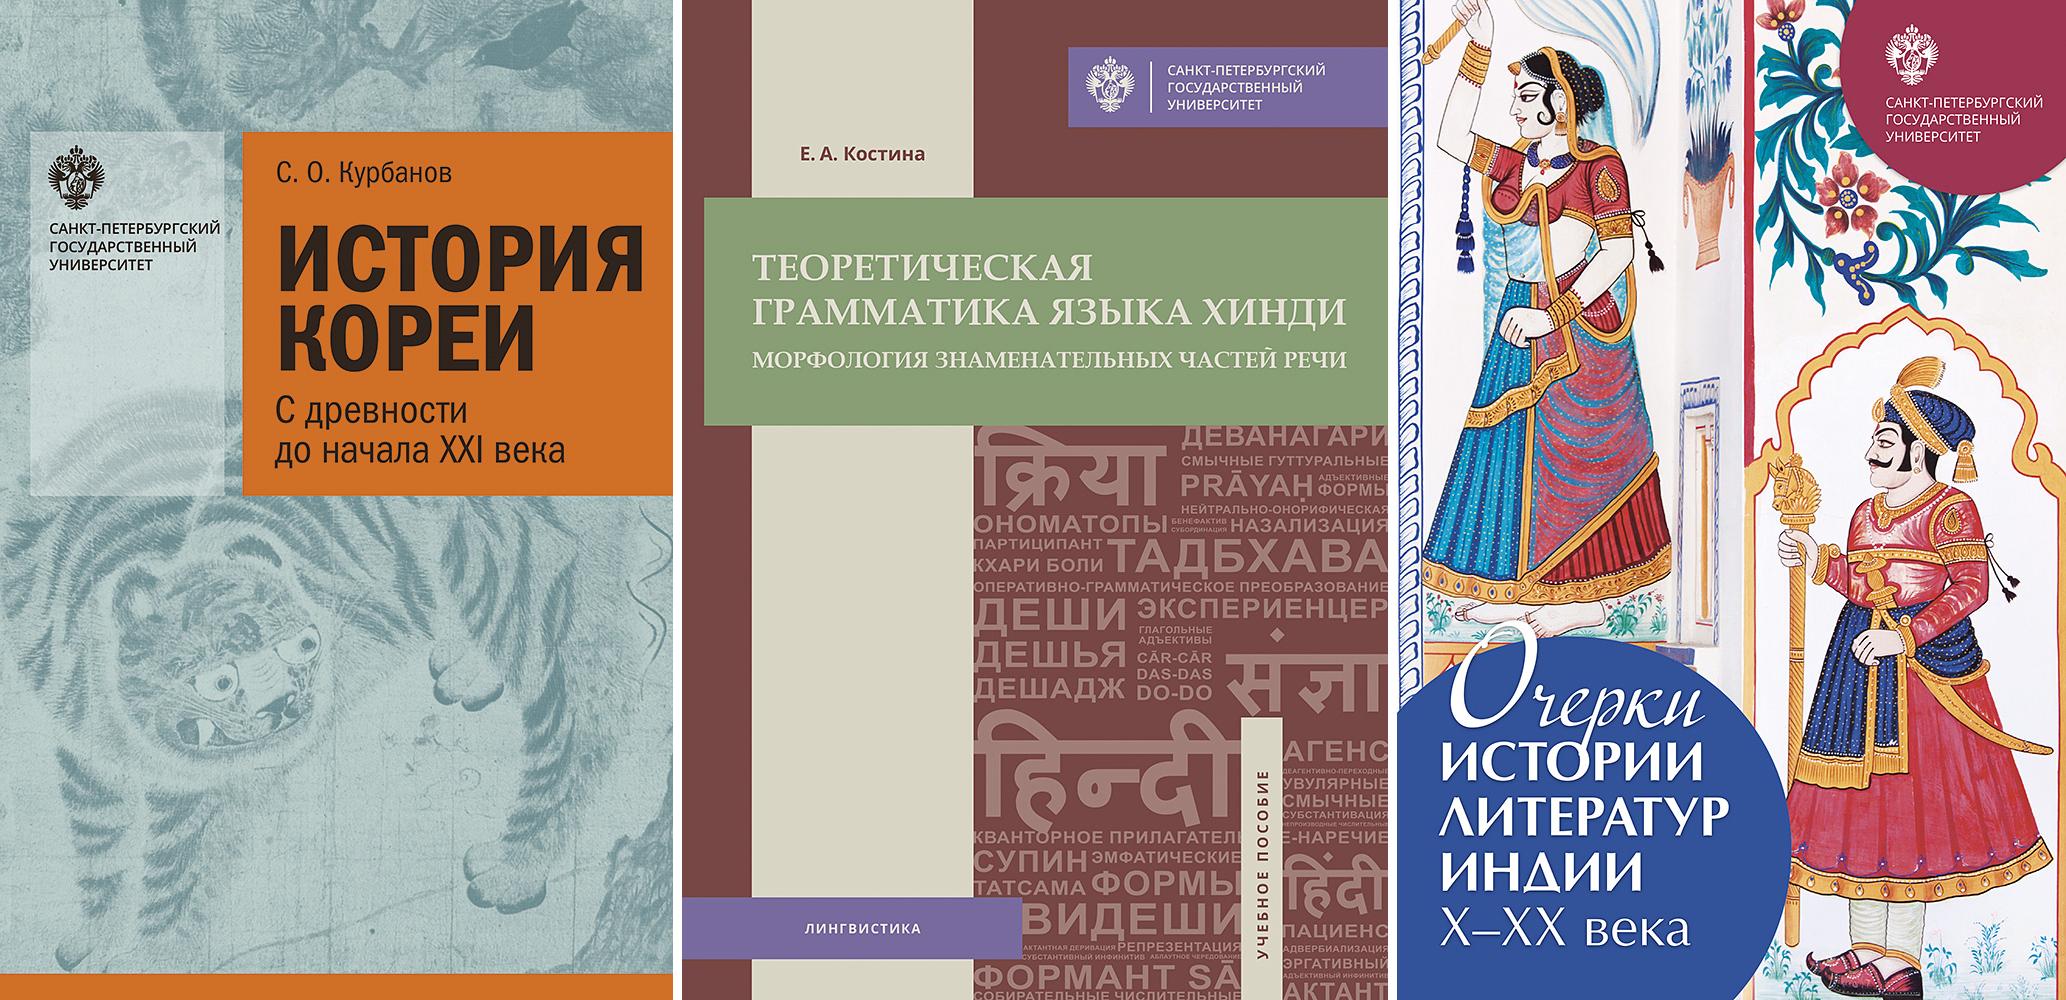 Новые книги от преподавателей СПбГУ